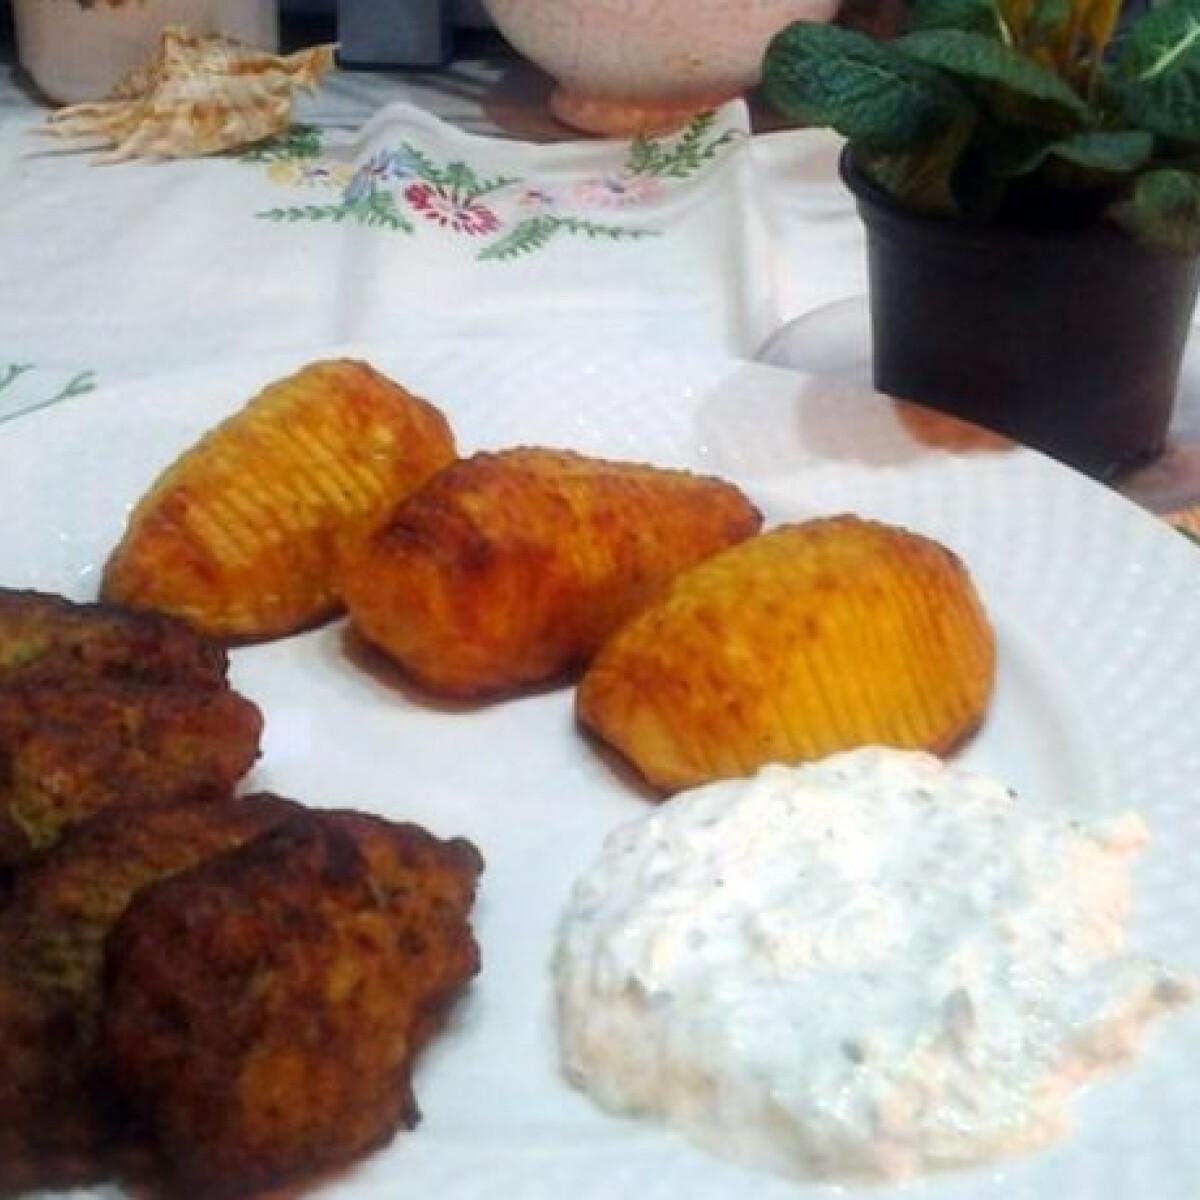 Cukkinis-húsos fasírt sült krumplival